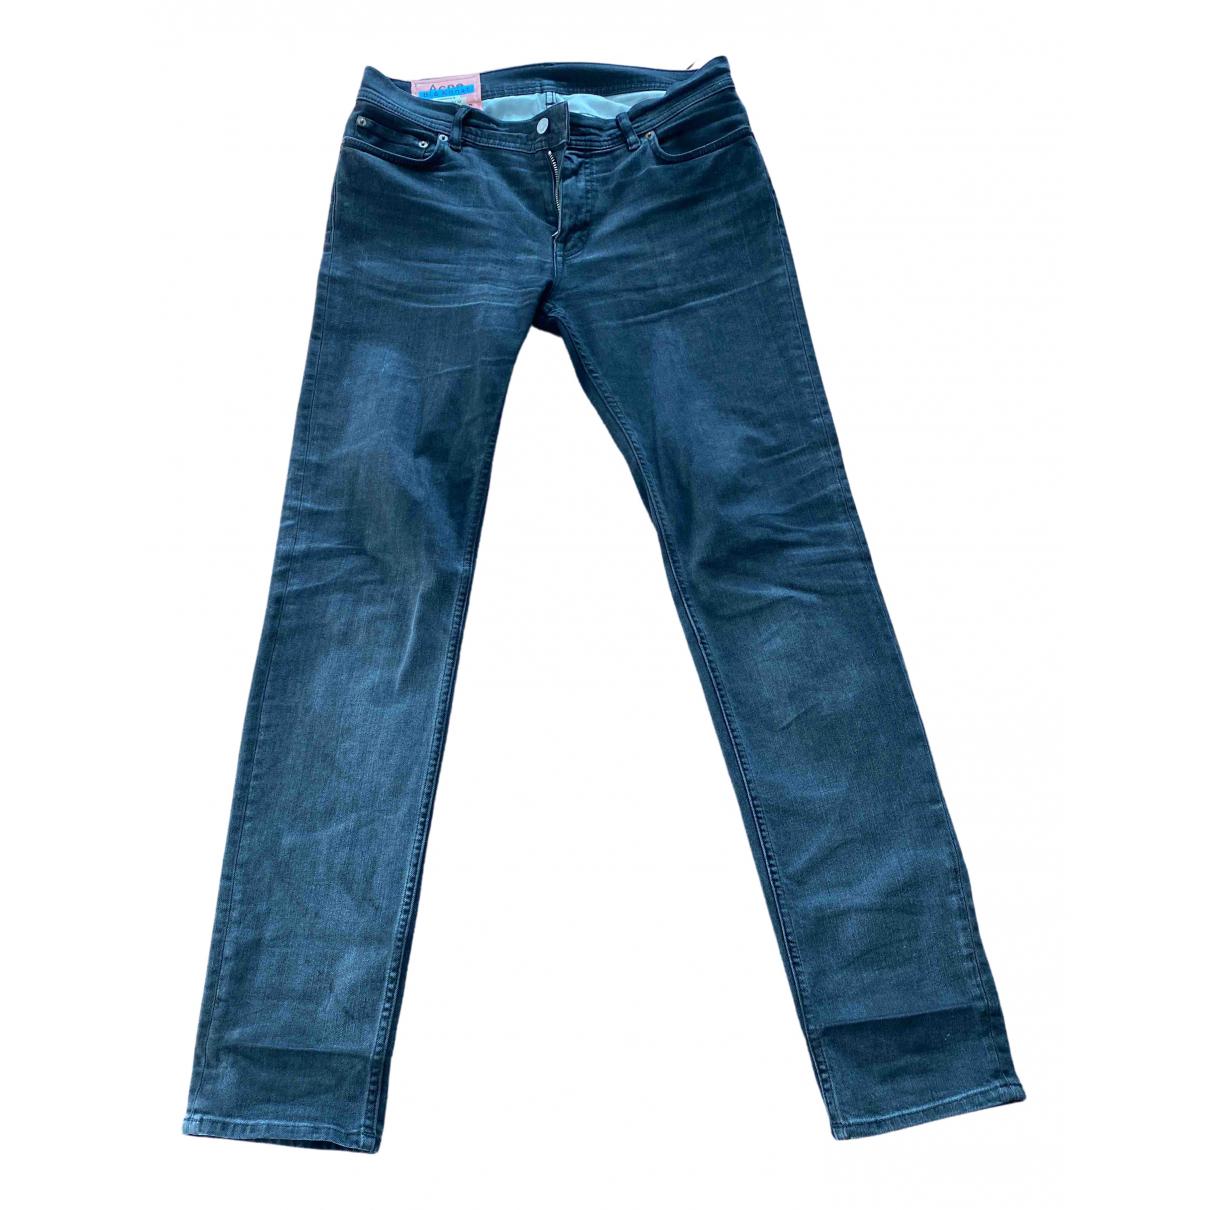 Acne Studios \N Anthracite Cotton Jeans for Men 32 UK - US